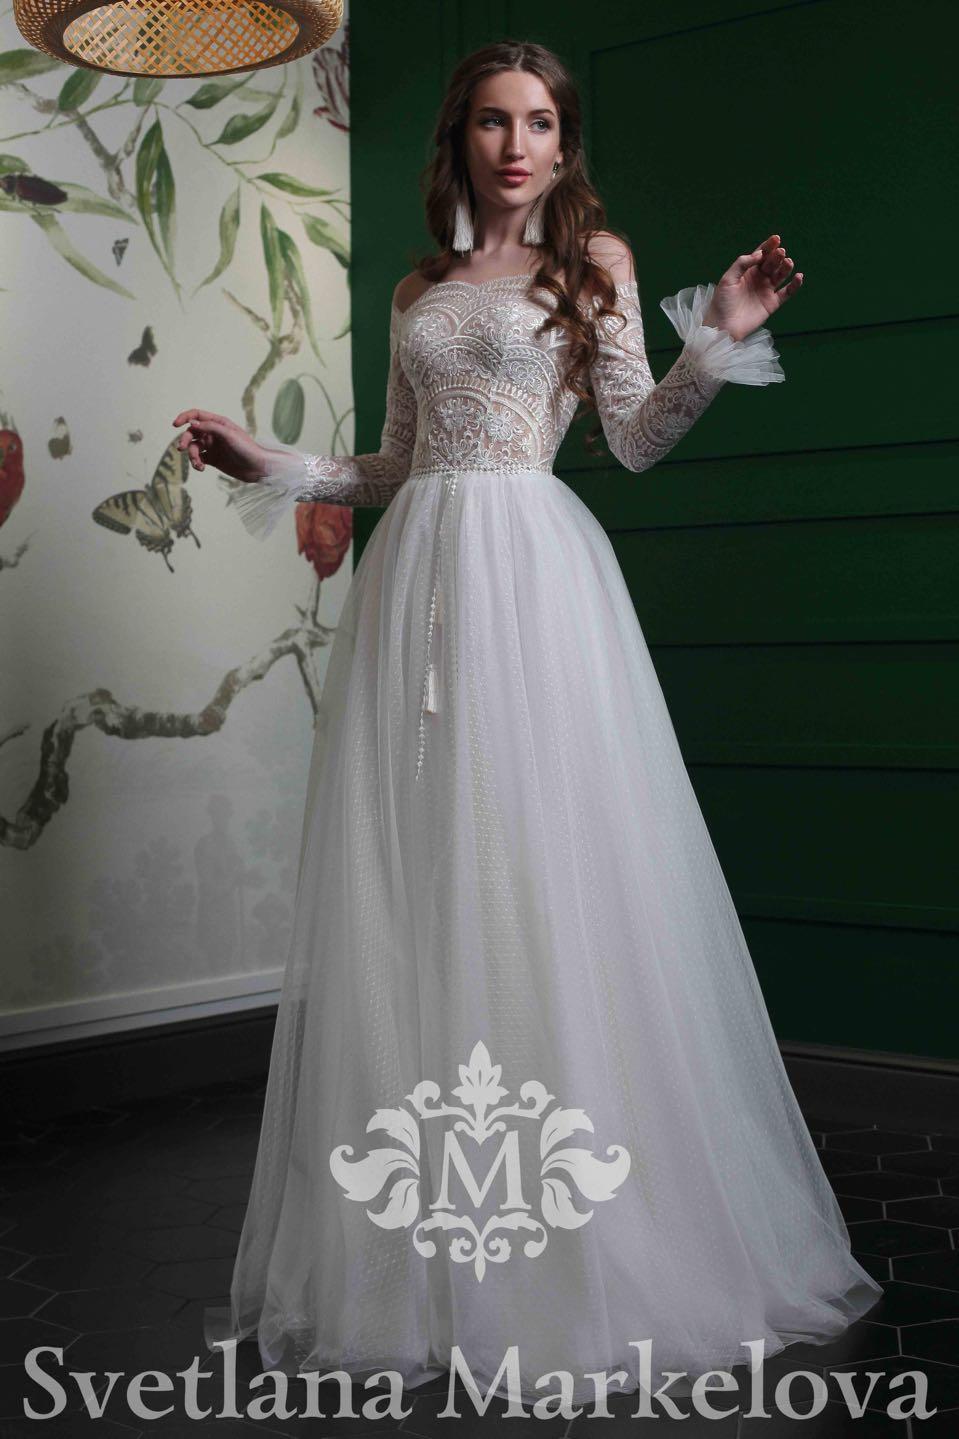 Свадебое платье Svetlana Markelova 2019 (Светлана Маркелова)